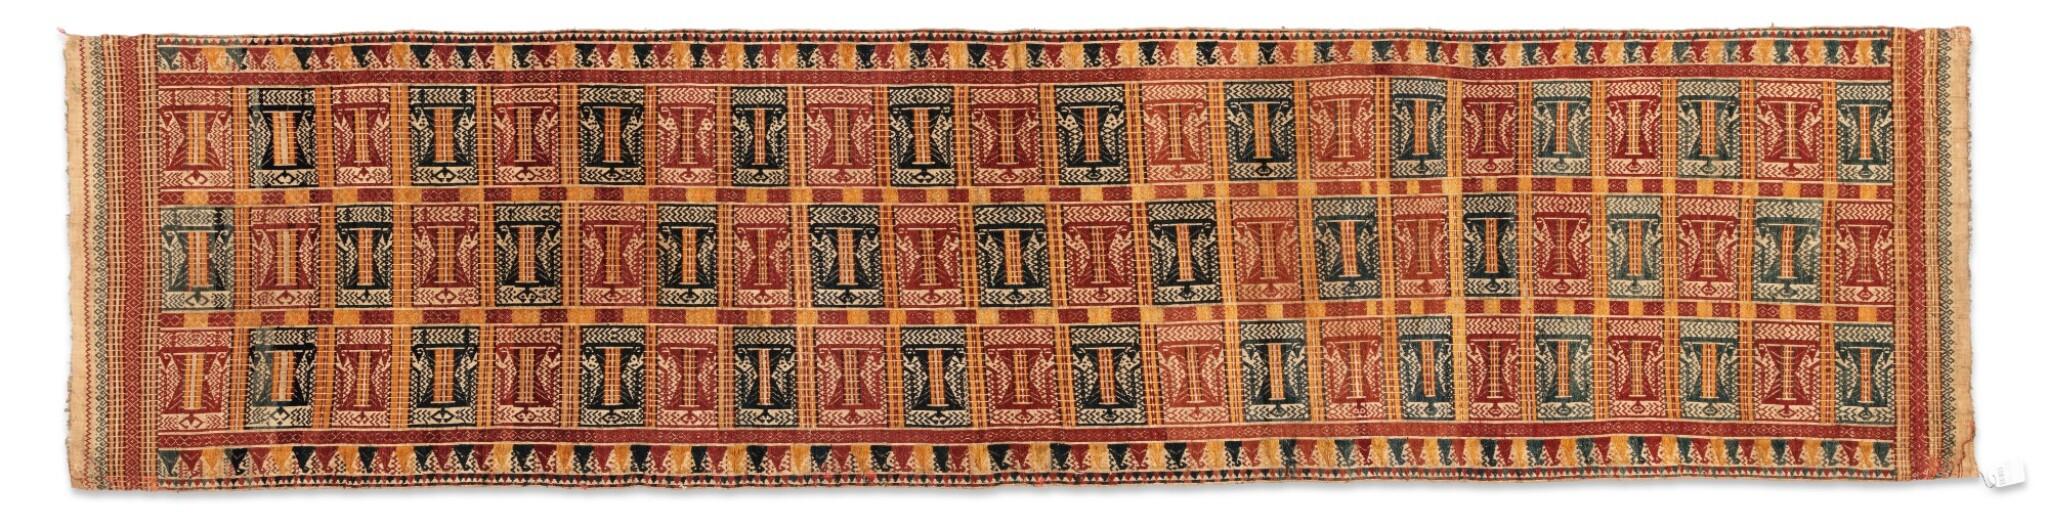 "View full screen - View 1 of Lot 41. Tissu cérémoniel ""à jonques"" palepai, Lampung, Sumatra, Indonesia, ca.1900 | Ceremonial hanging ""ship cloth"" palepai, Lampung, Sumatra, Indonesia, about 1900."